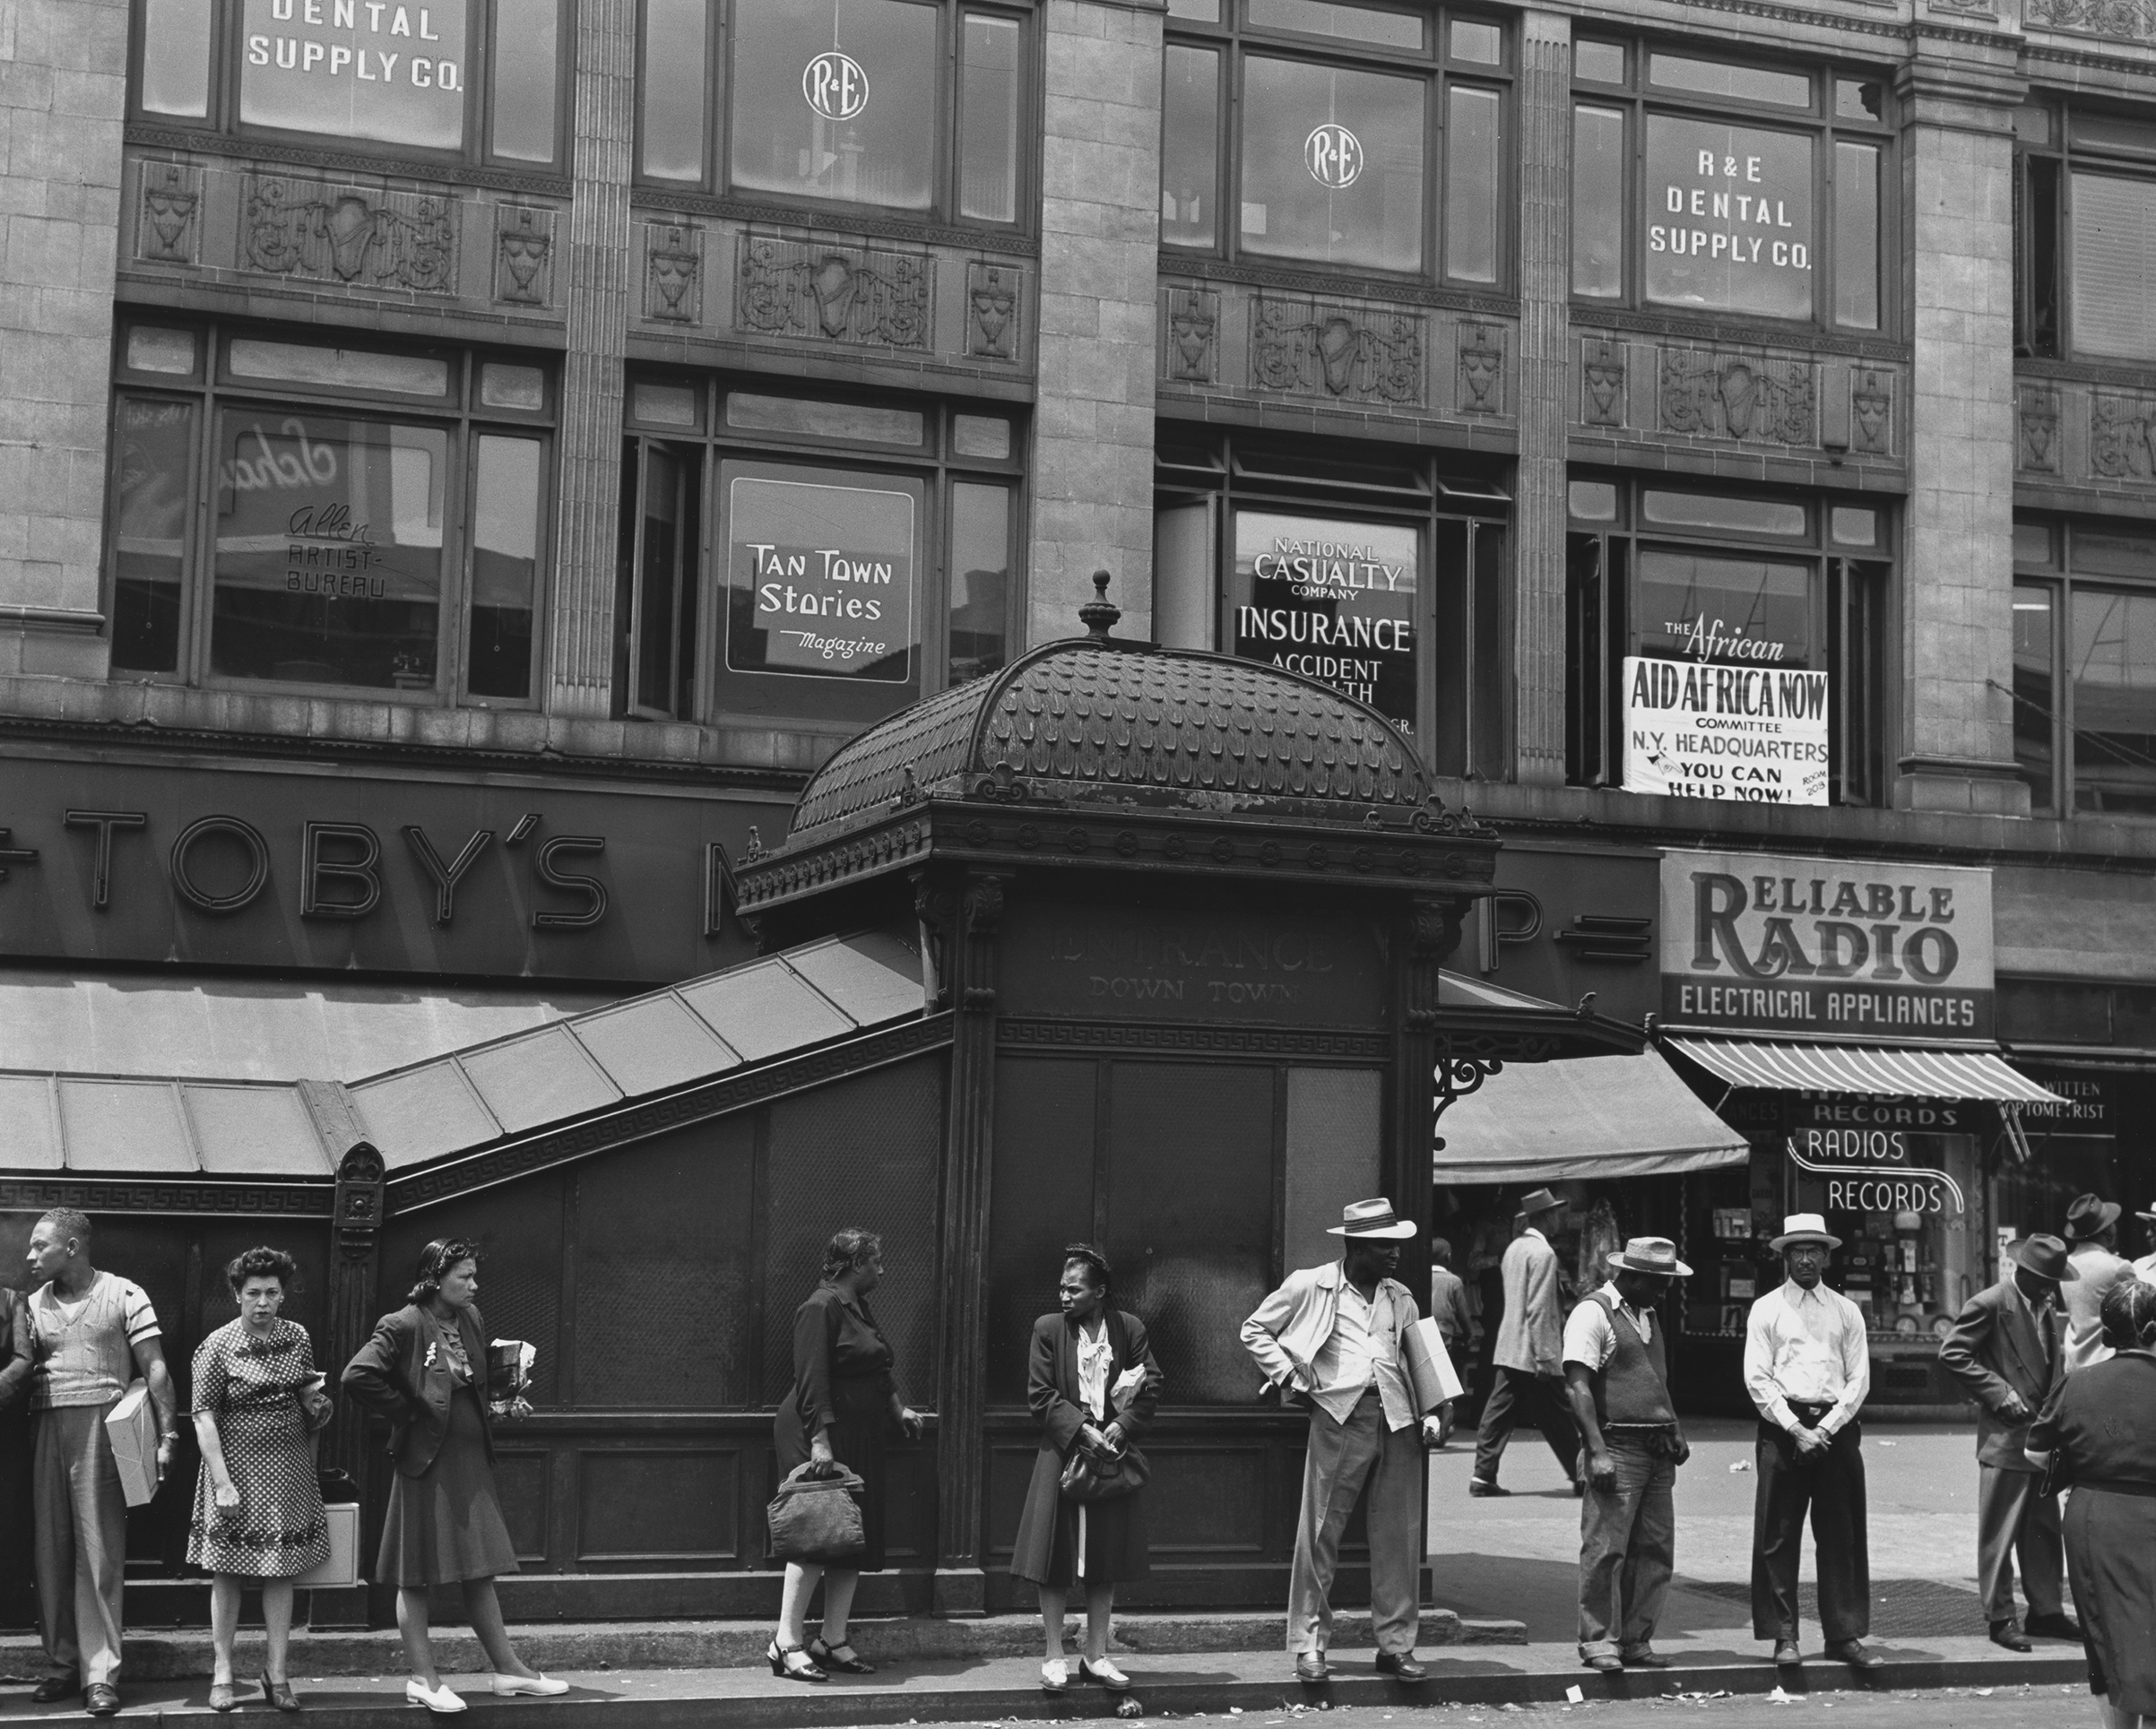 St. Nicholas Avenue and 125th Street, Harlem, 1946.